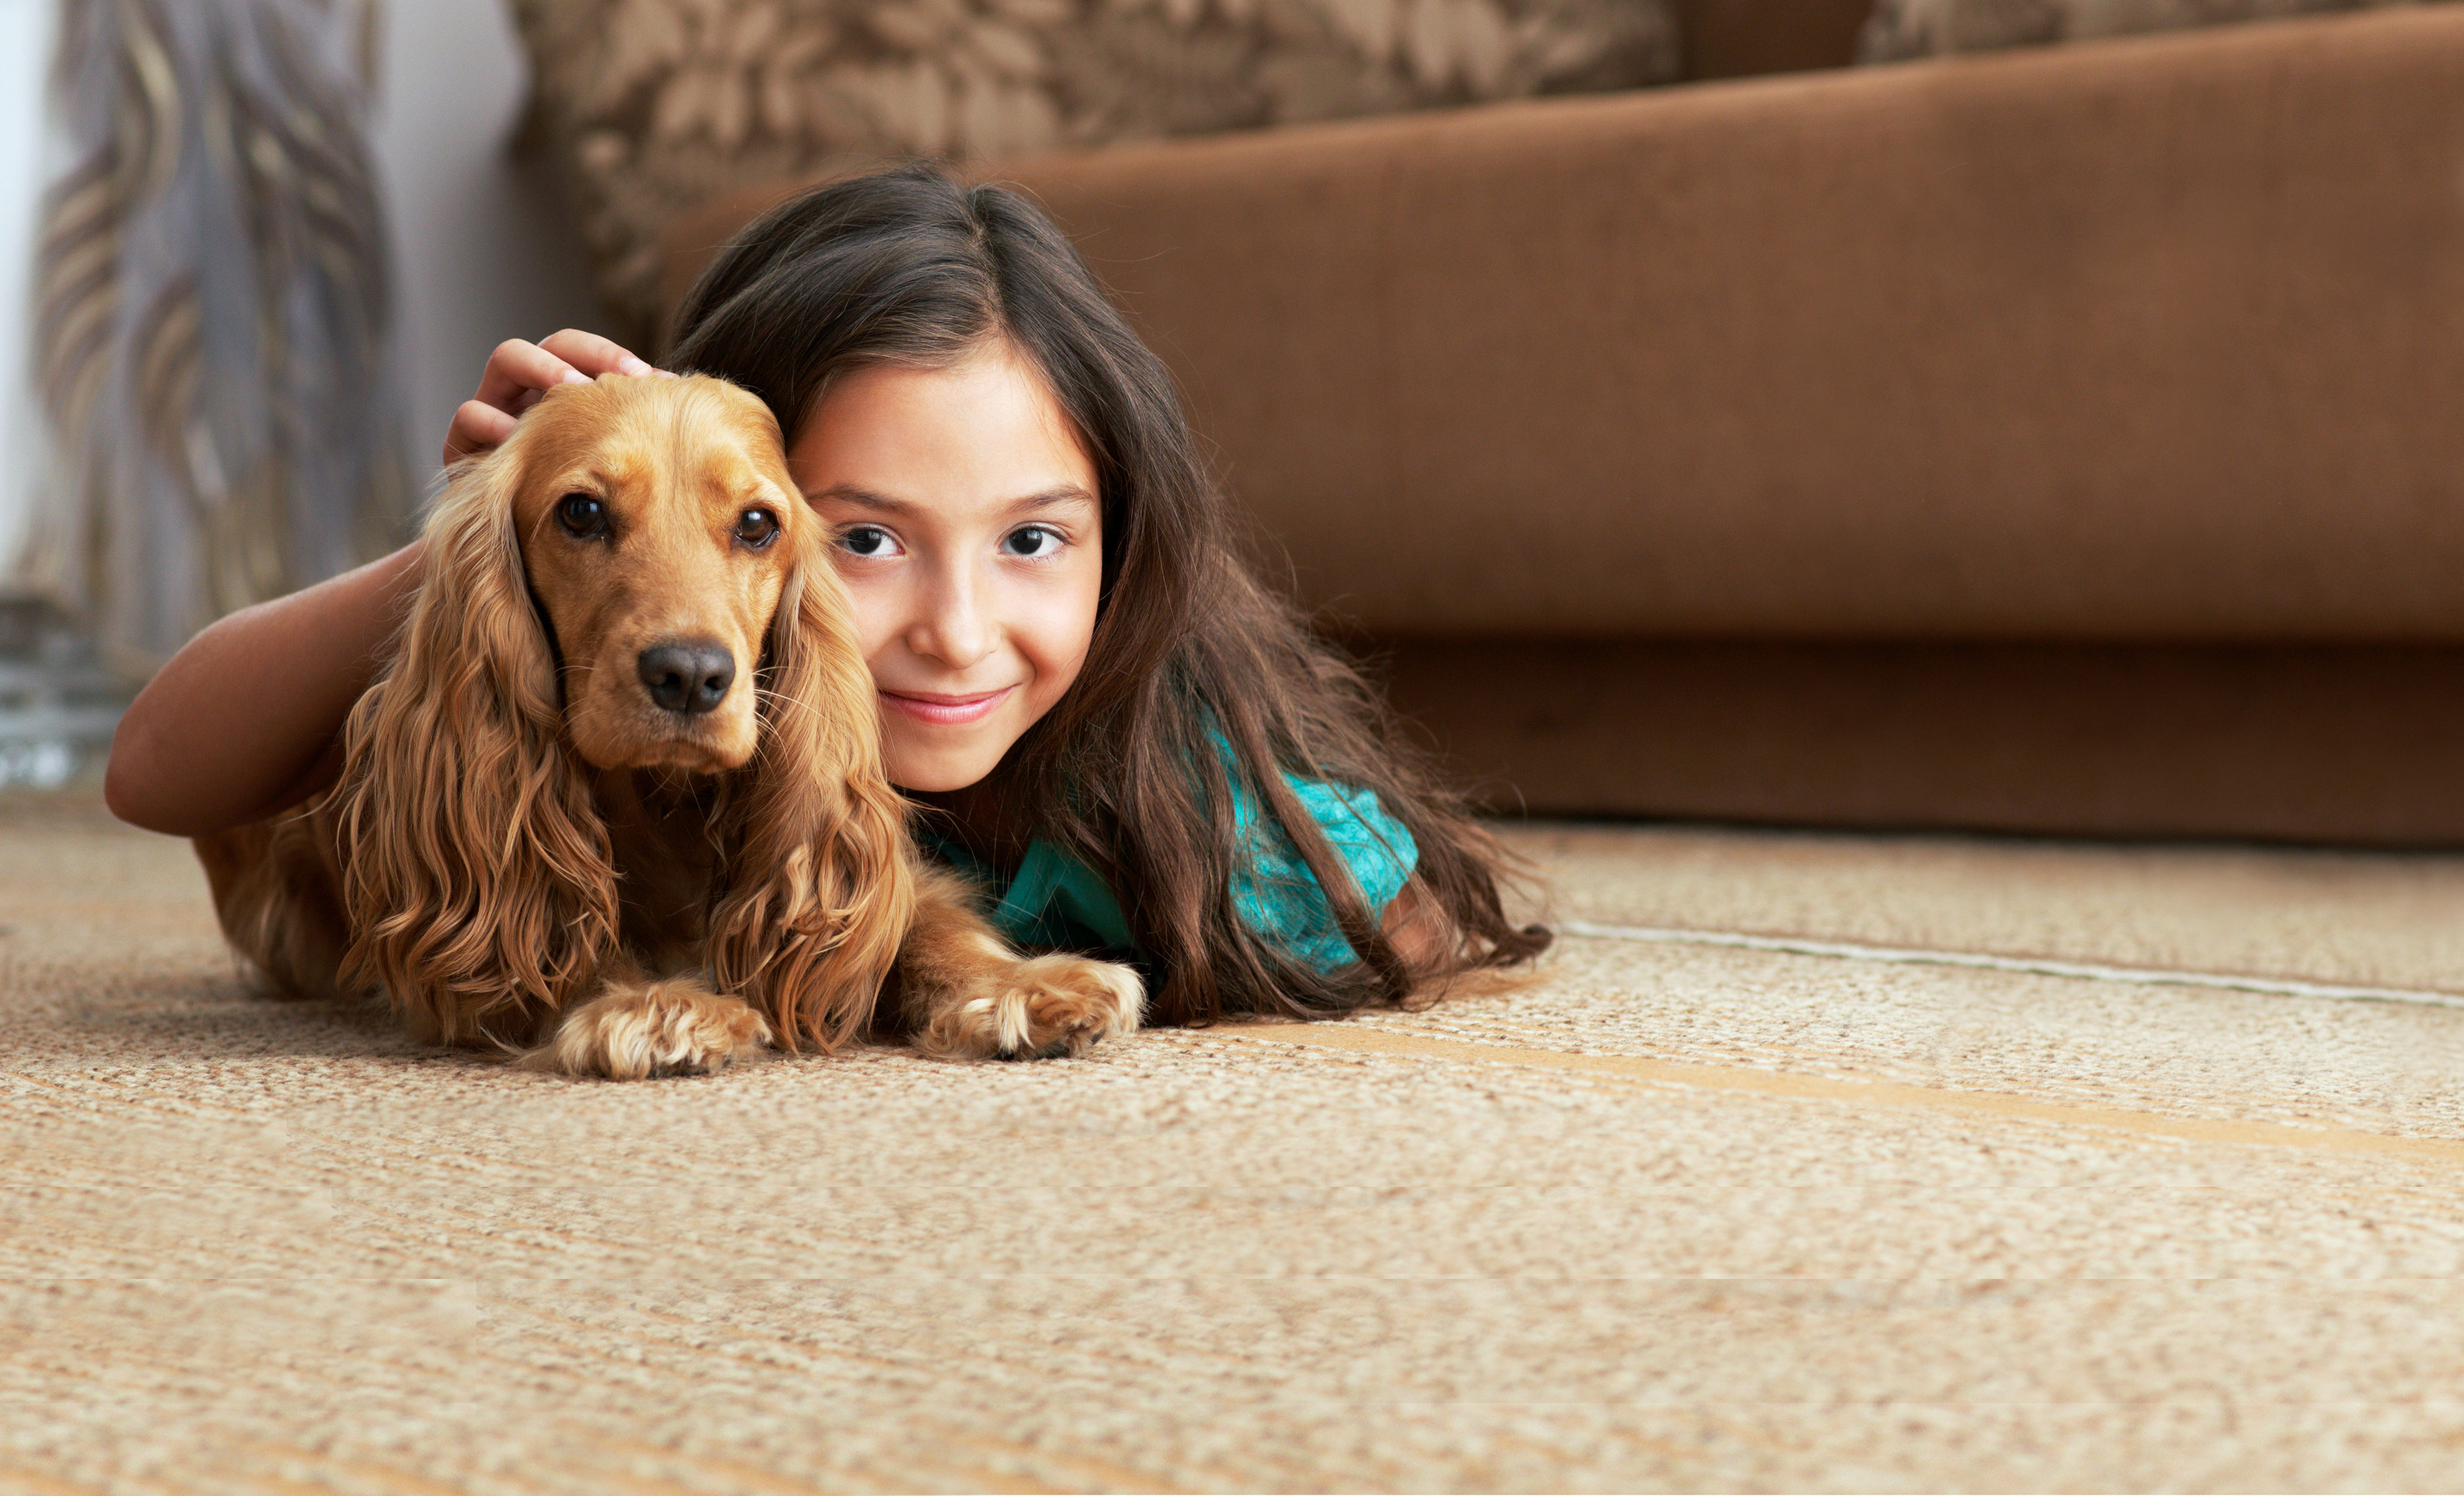 Girl With Dog On Carpet Chem Dry